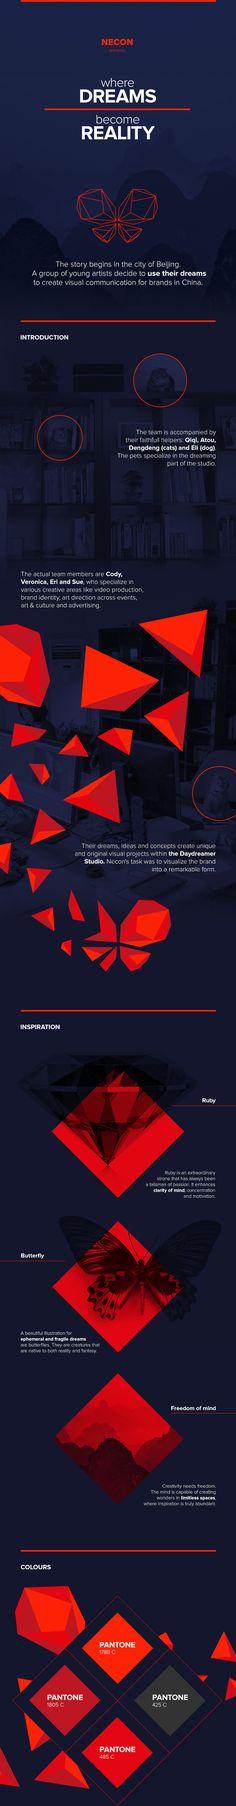 9.Visual Identity and Branding Series  Daydreamer